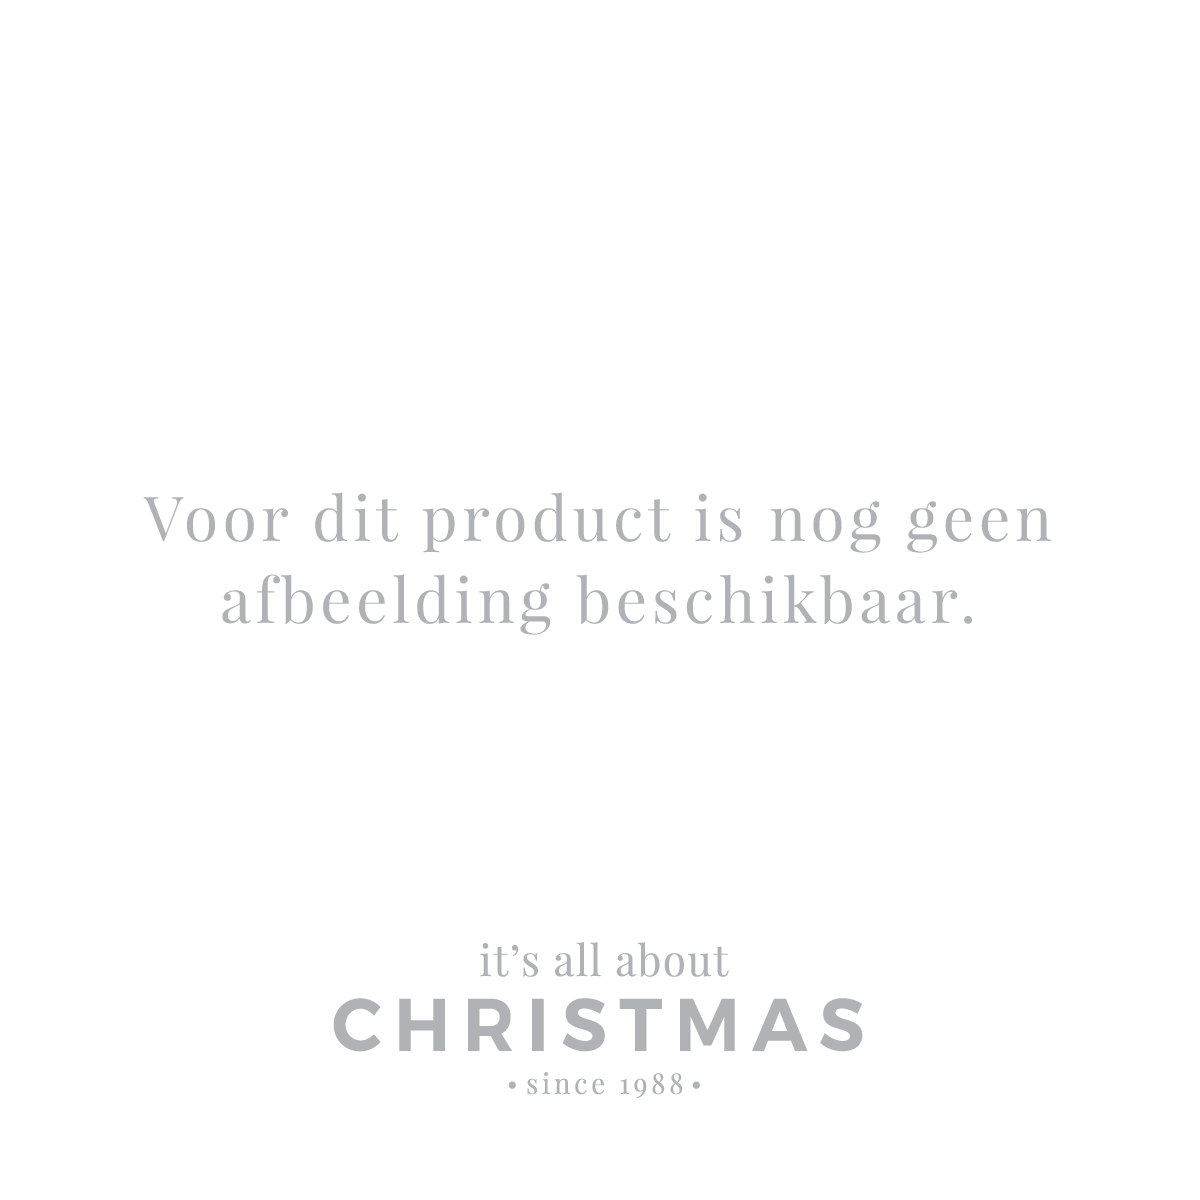 Christbaumkugeln Set Bunt.Weihnachtskugeln Set Christbaumkugel Set Kaufen